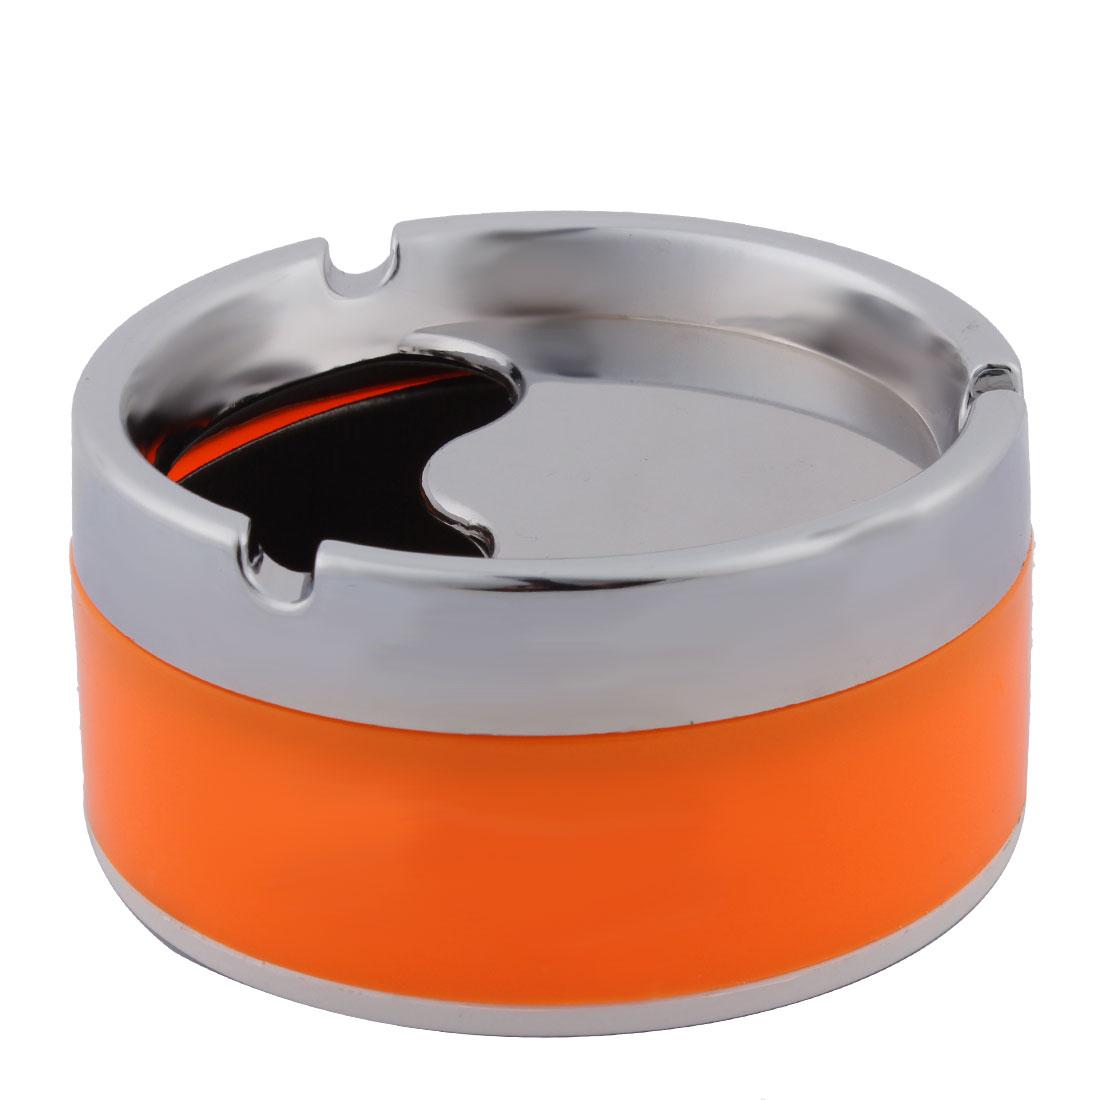 Household 3 Grooves Design Rotatable Cigarette Holder Case Ashtray Container 10cm Dia